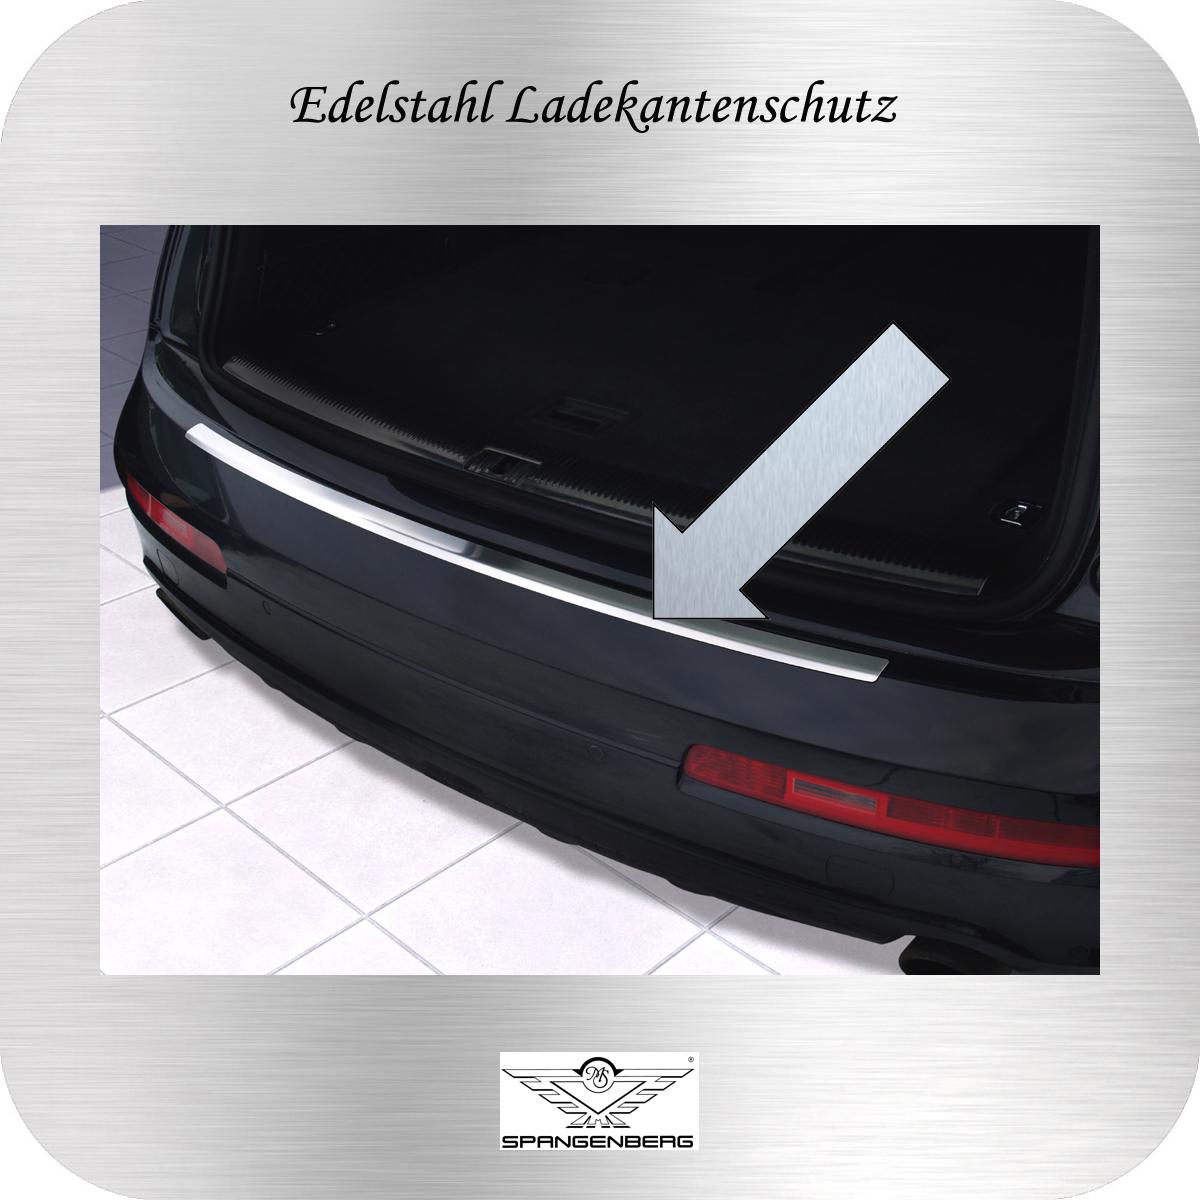 Ladekantenschutz Edelstahl Audi Q7 I SUV Typ 4L Kombi 2006-2015 3235730